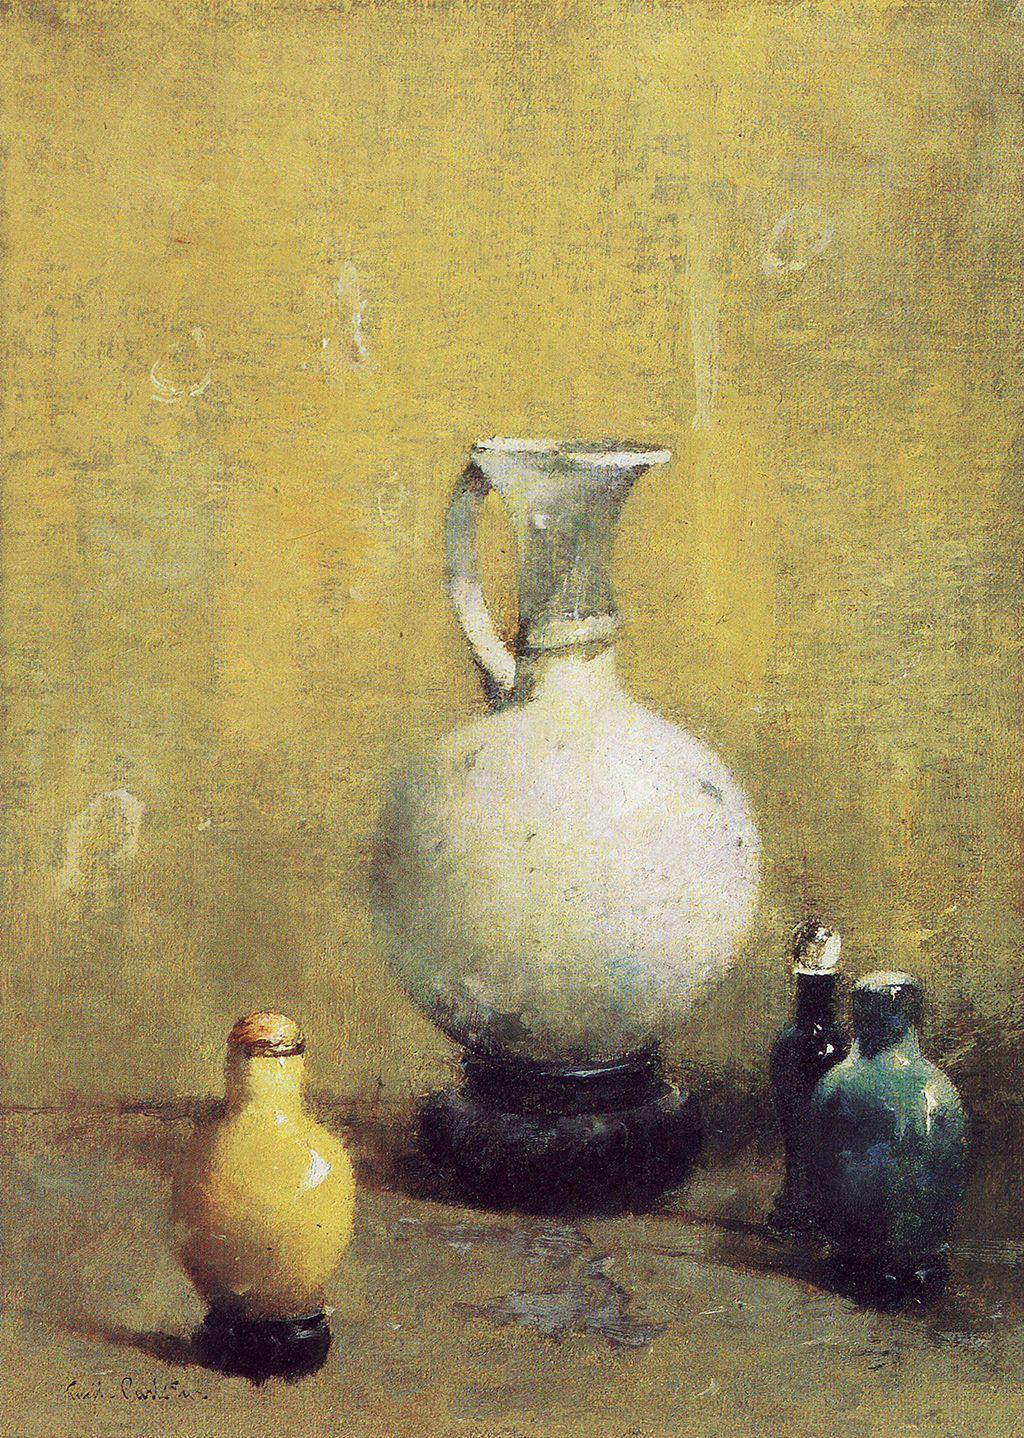 Emil carlsen still life with ceramic vase c1913 nature morte emil carlsen still life with ceramic vase c1913 reviewsmspy